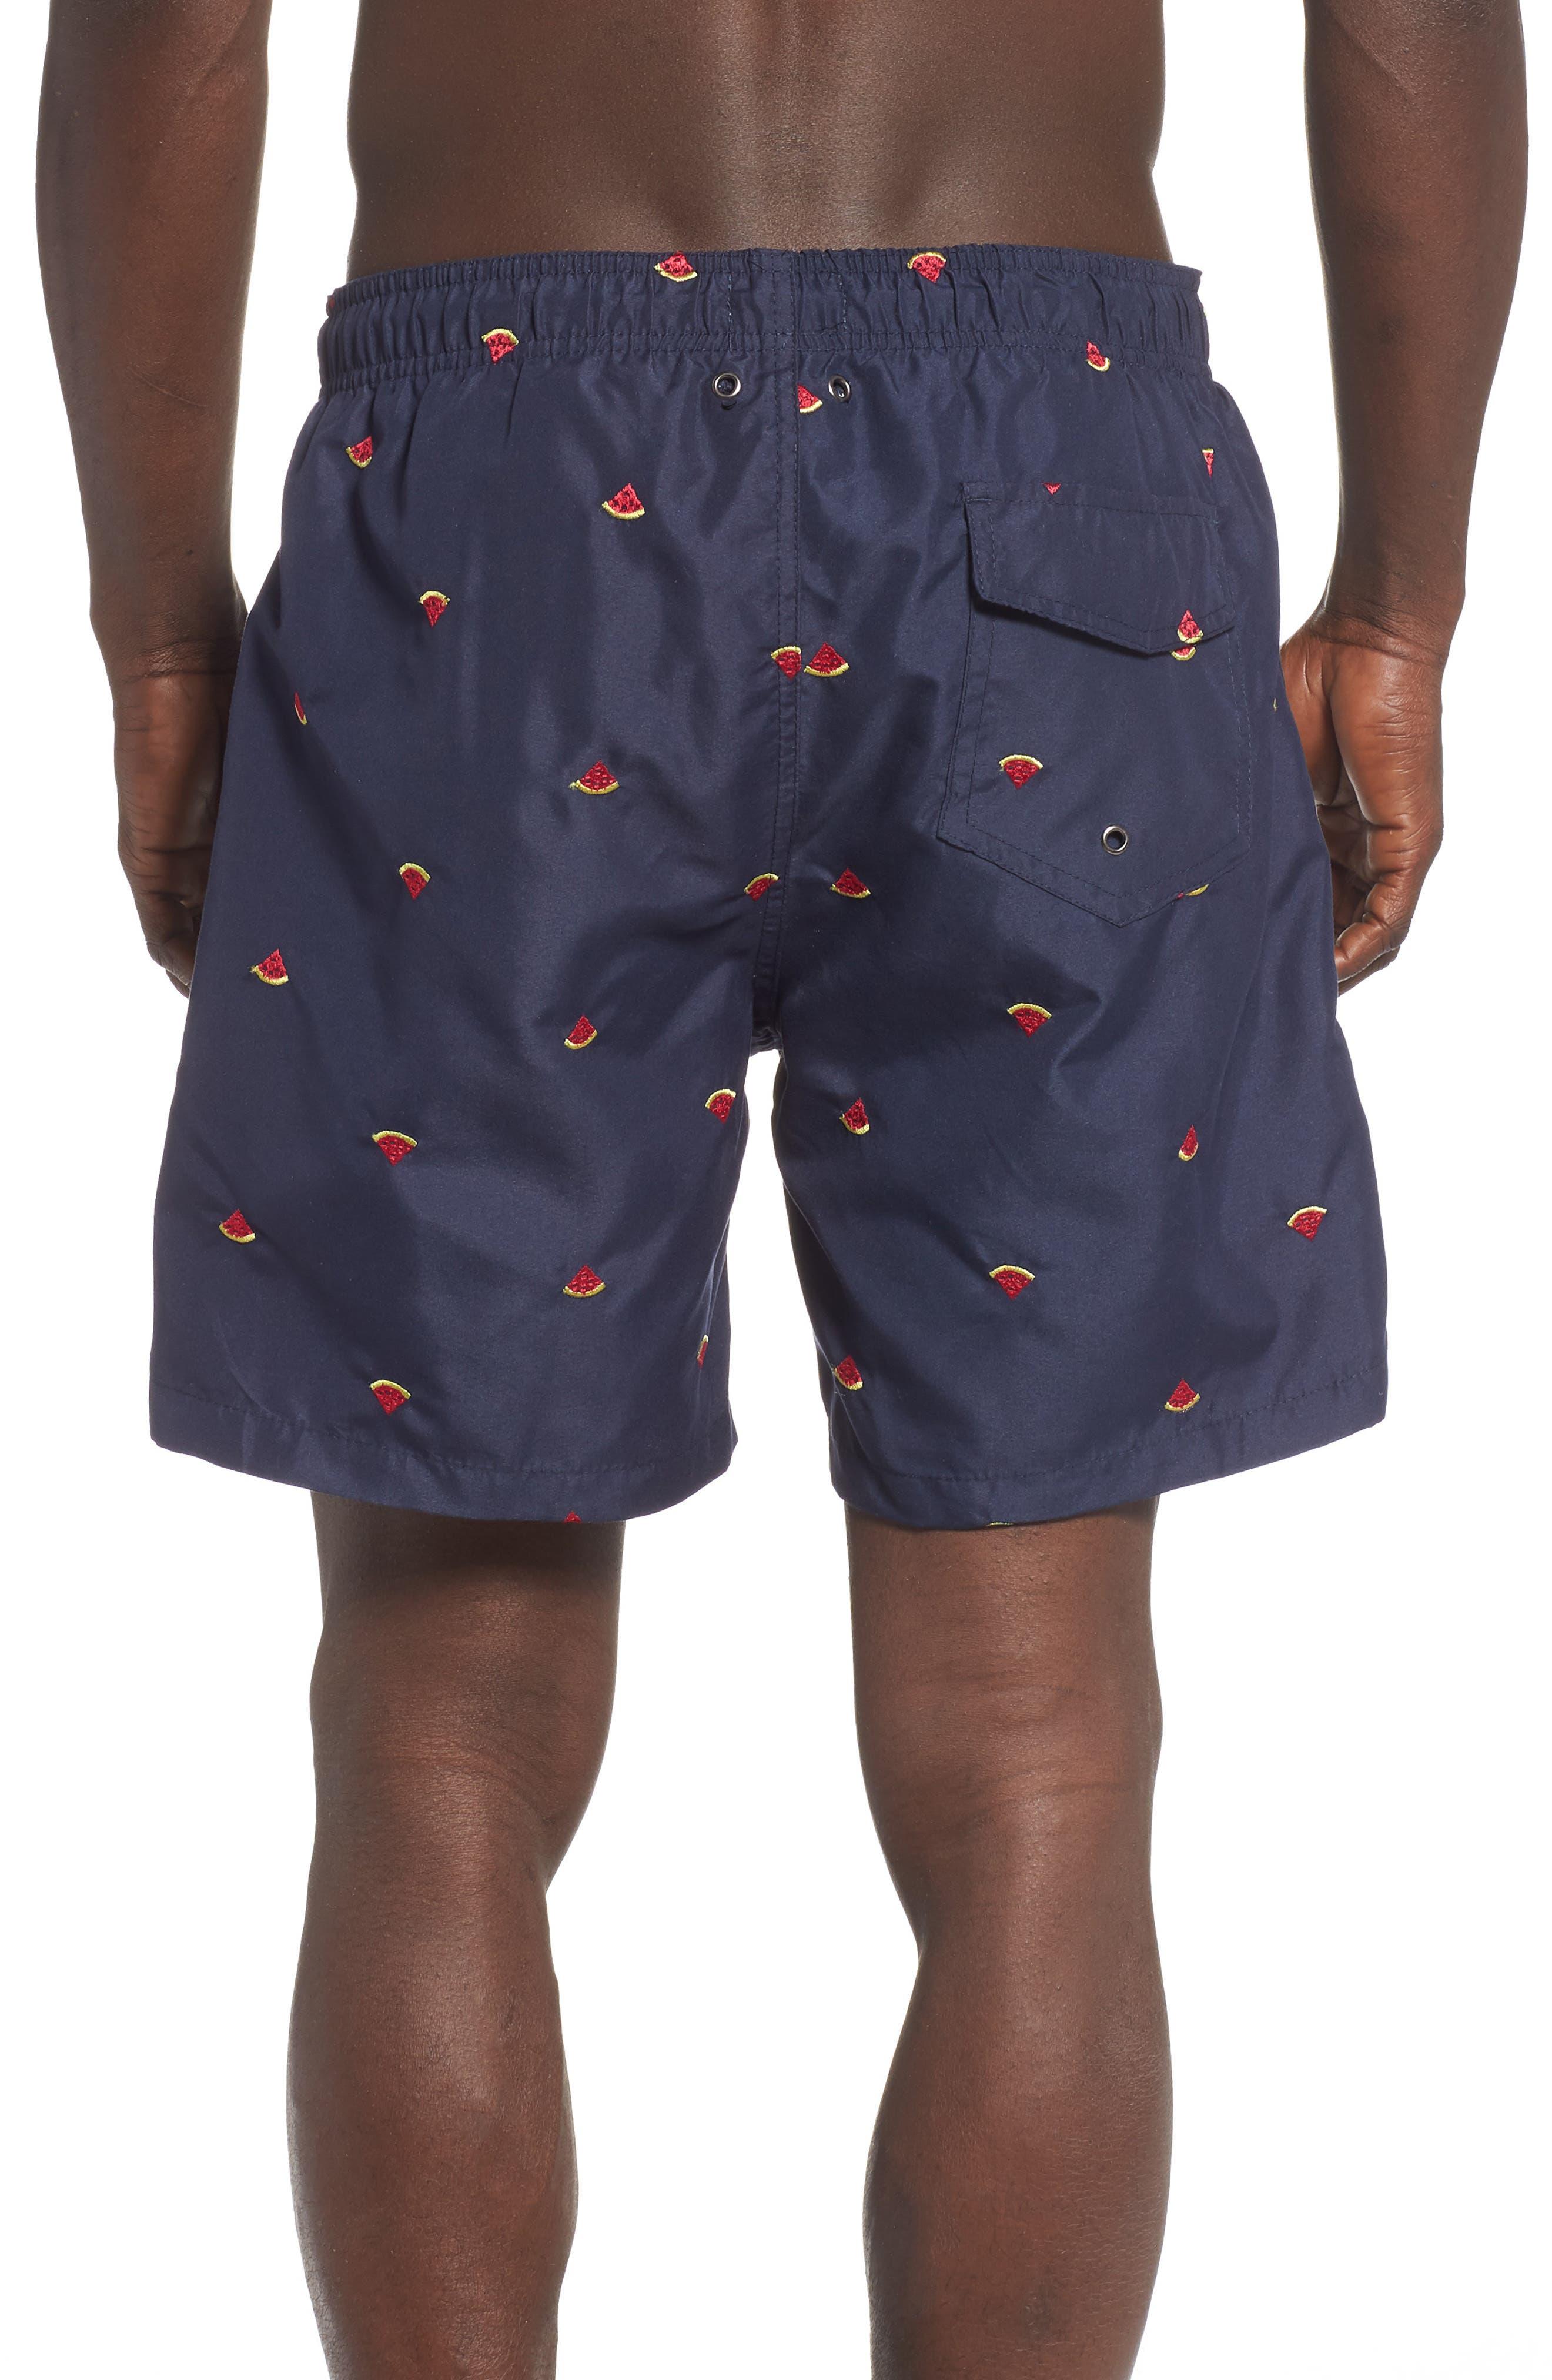 Premium Embroidered Sano Swim Trunks,                             Alternate thumbnail 2, color,                             WATERMELON DRAWING